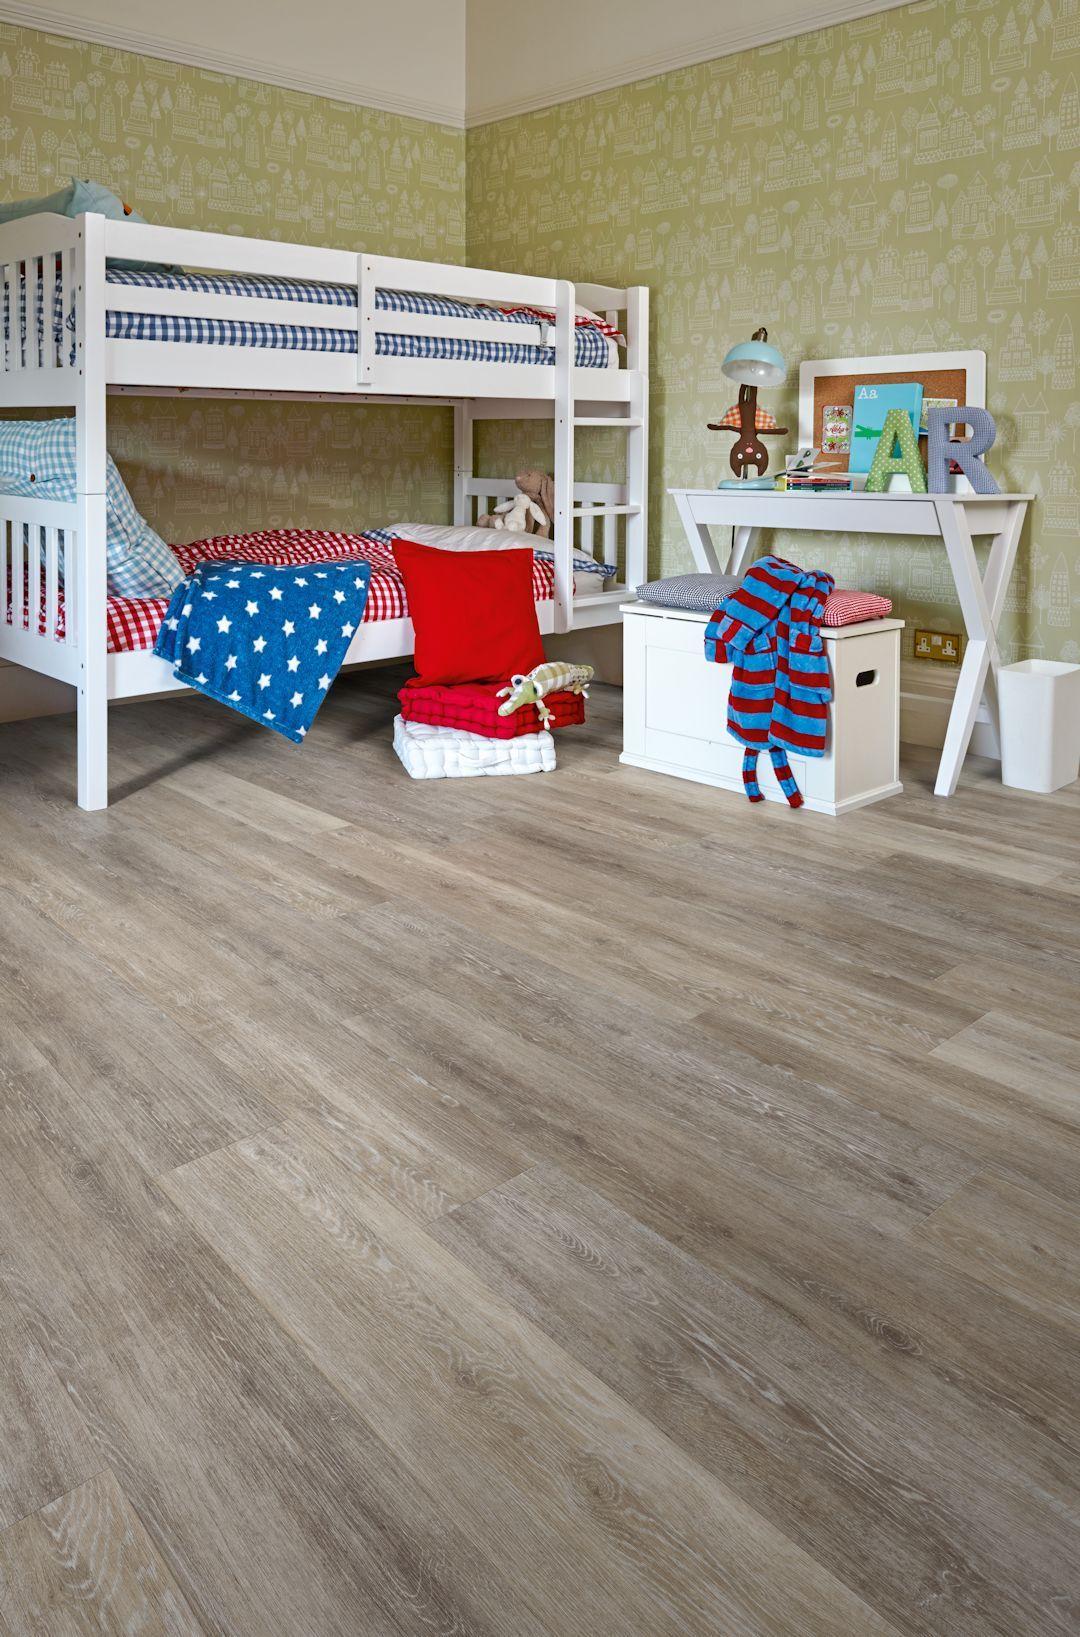 Boathouse Oak Camaro Luxury Vinyl Tile Flooring Featured In Kids